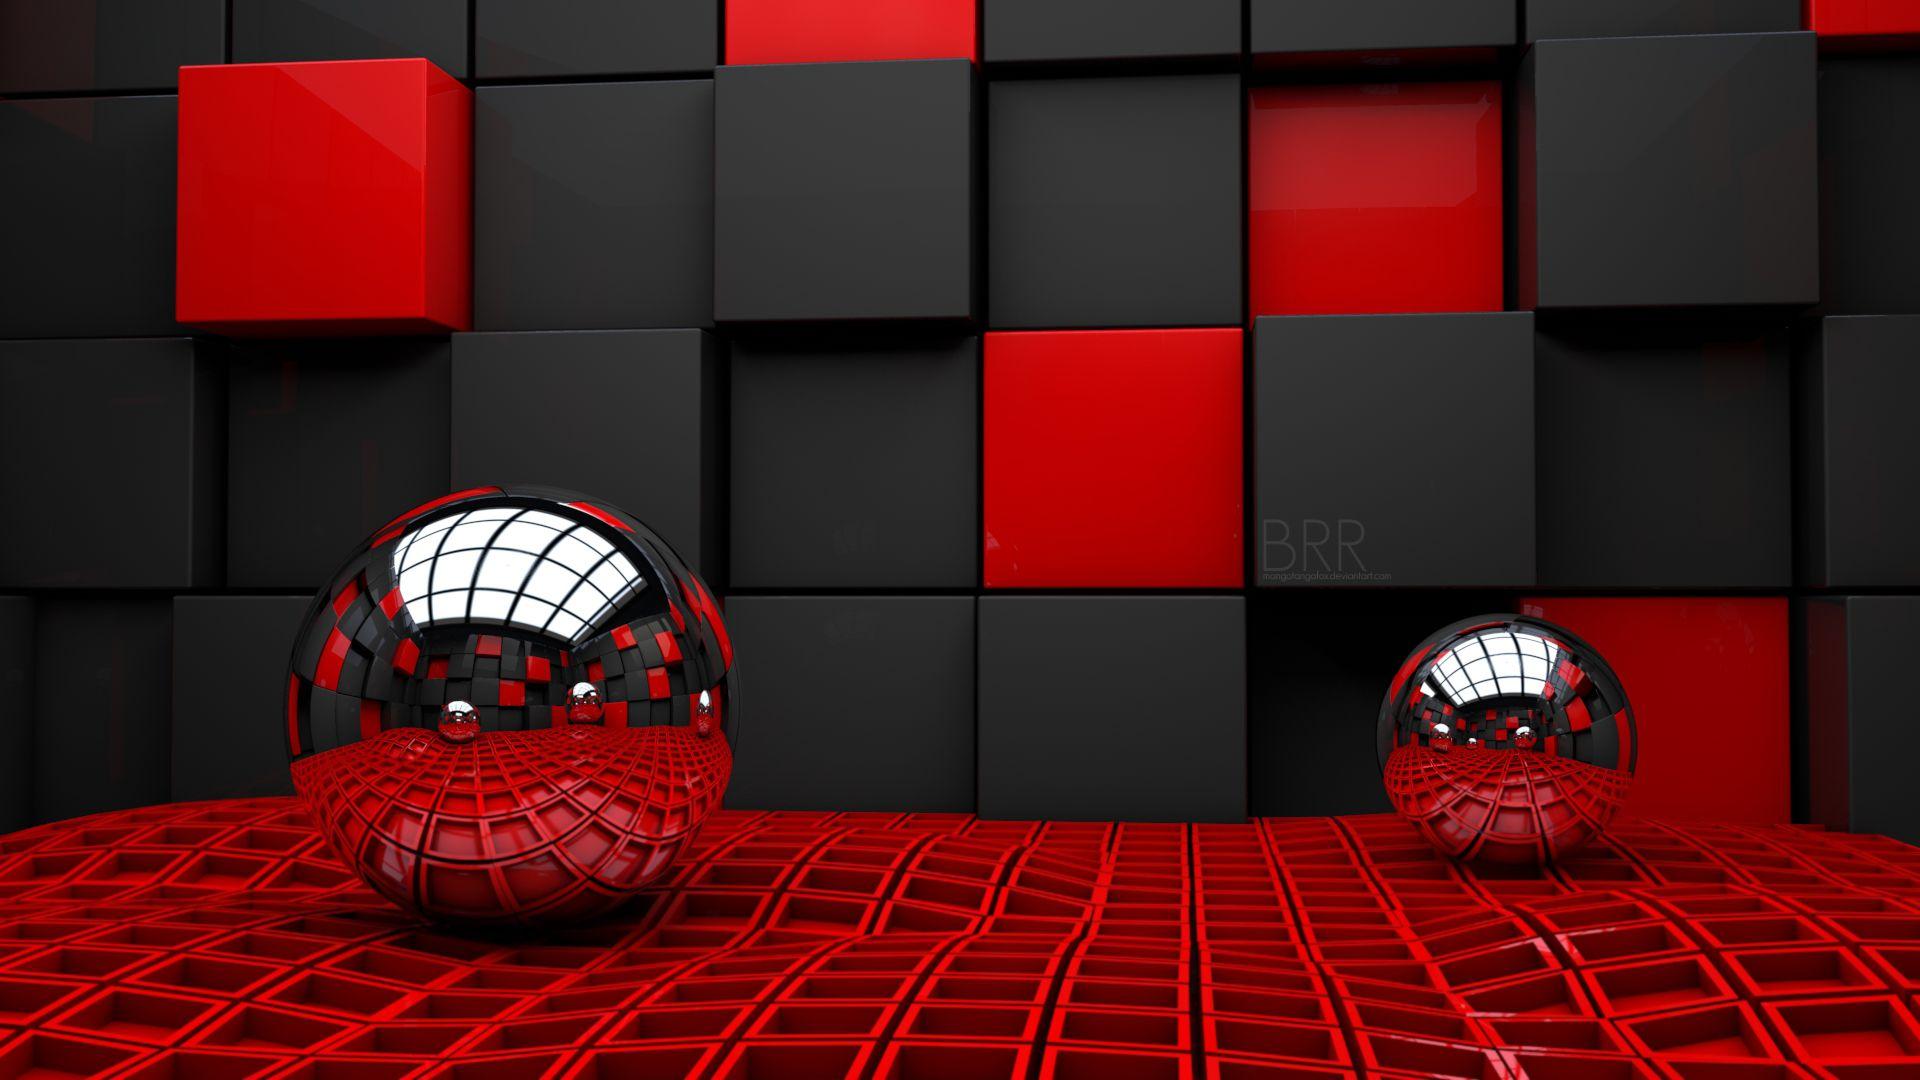 Red And Black Cubes Background Hd Wallpaper Cool 3d Wallpapers 3d Desktop Wallpaper